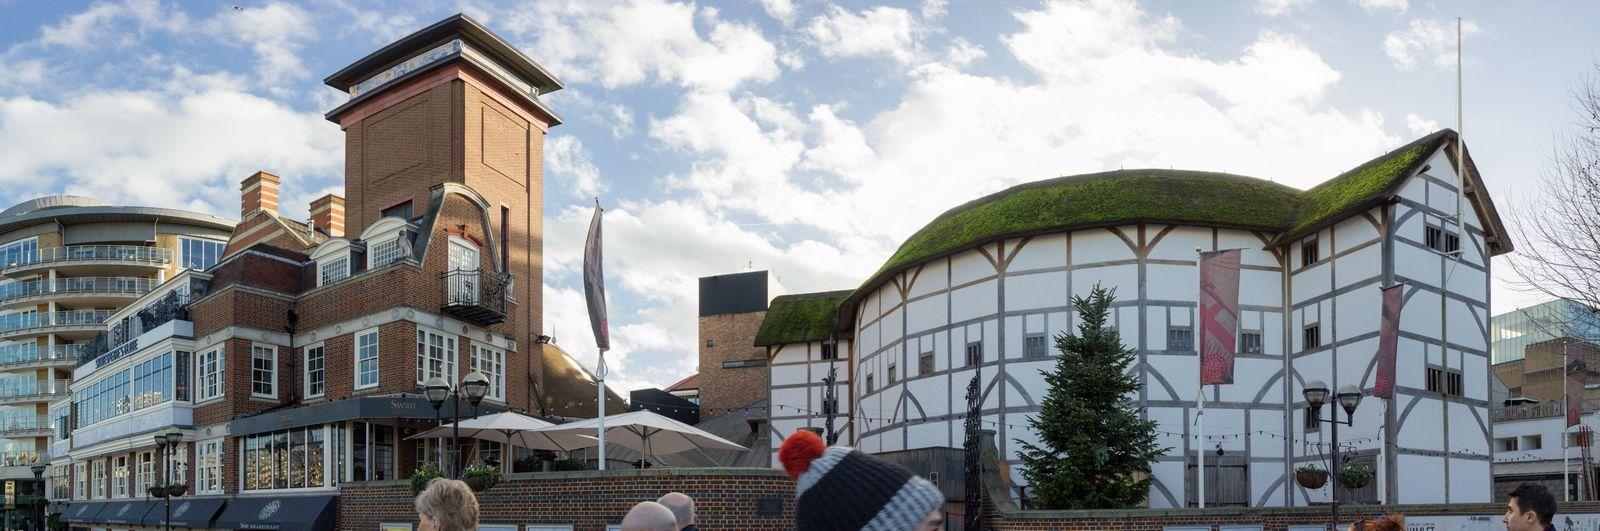 El Shakespeare's Globe